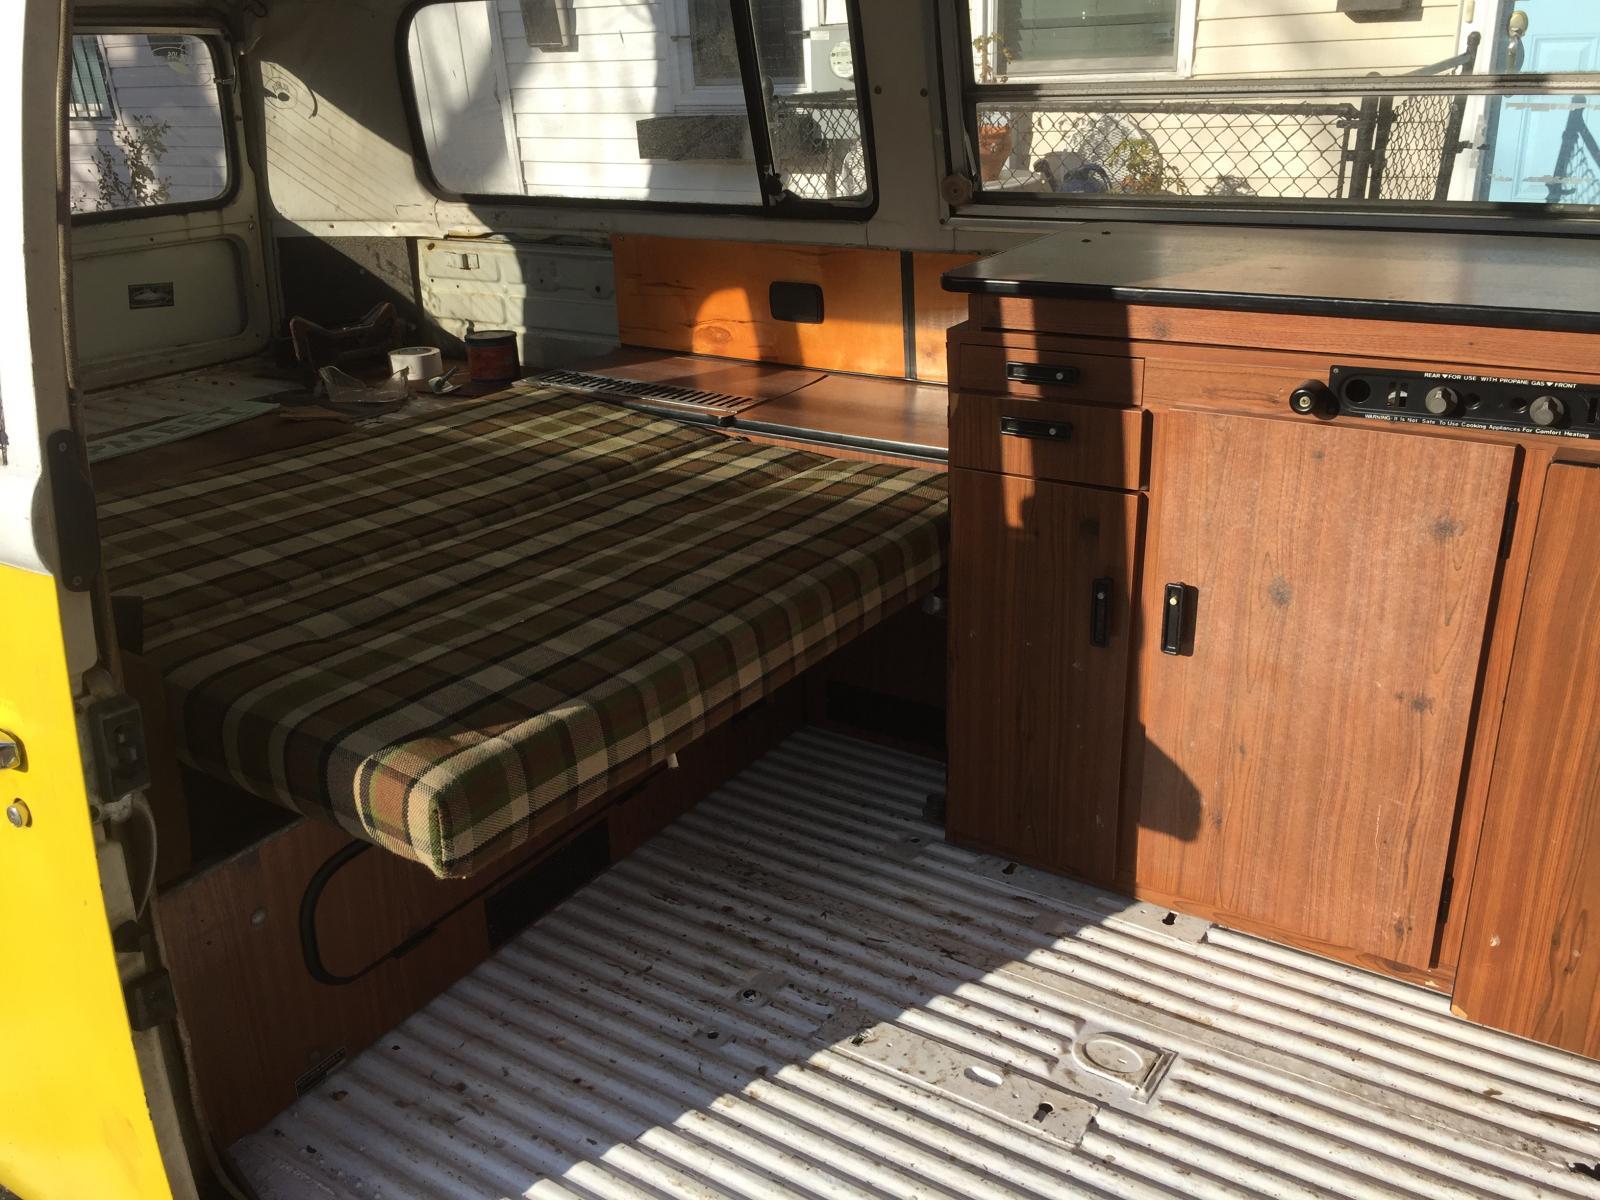 More progress on Tub Bus